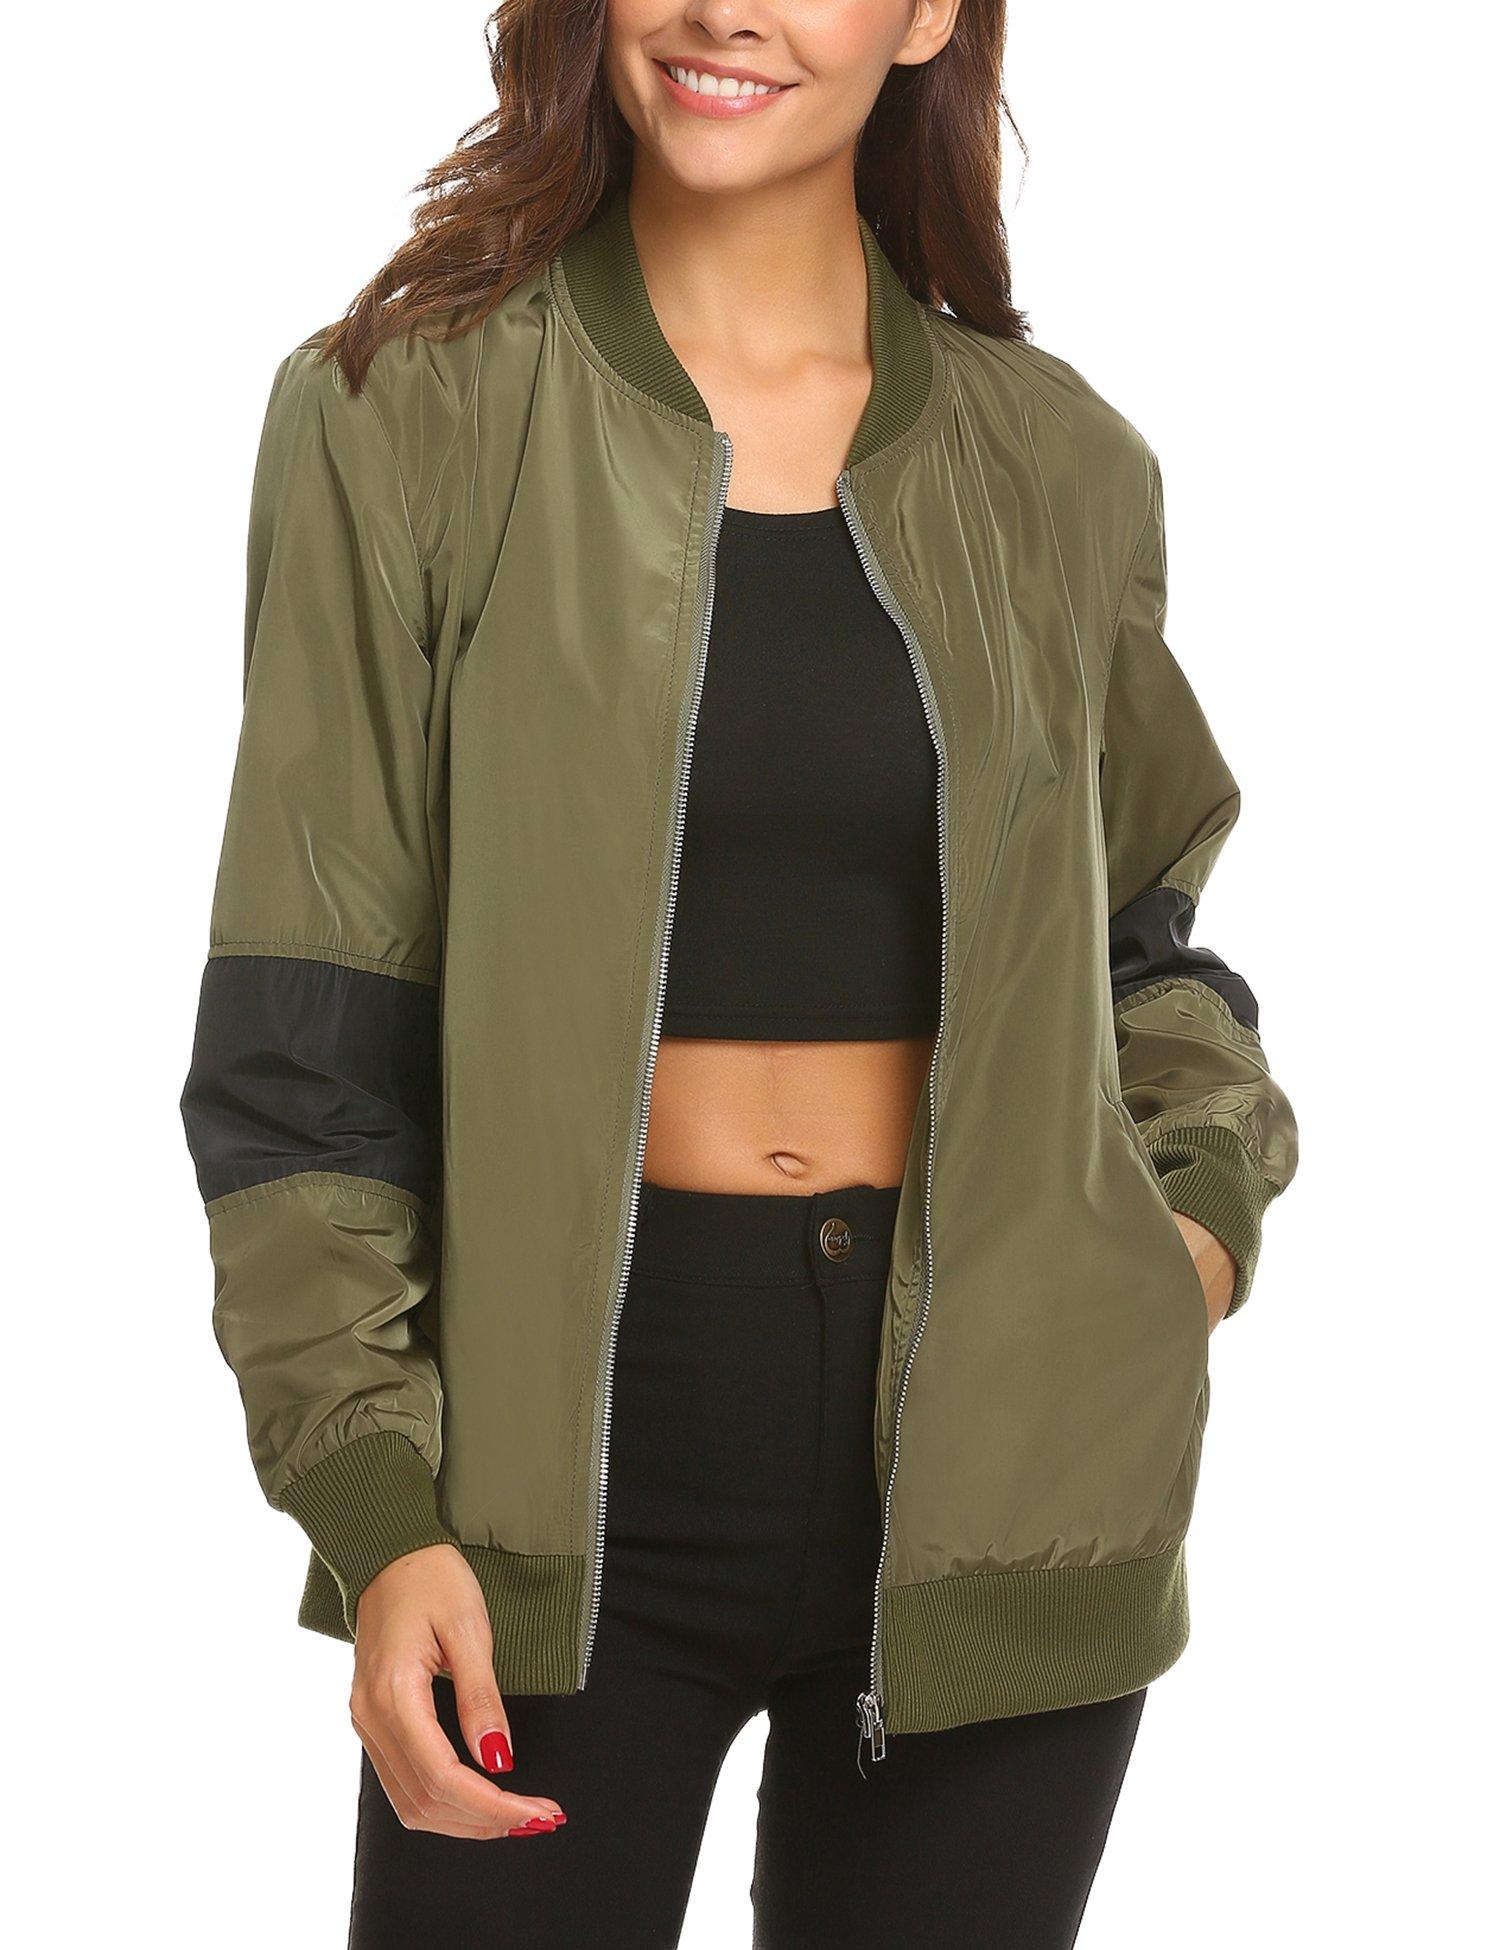 UNibelle Women's Zip up Striped Satin Baseball Bomber Jacket Coat with Pockets, Army Green, Medium